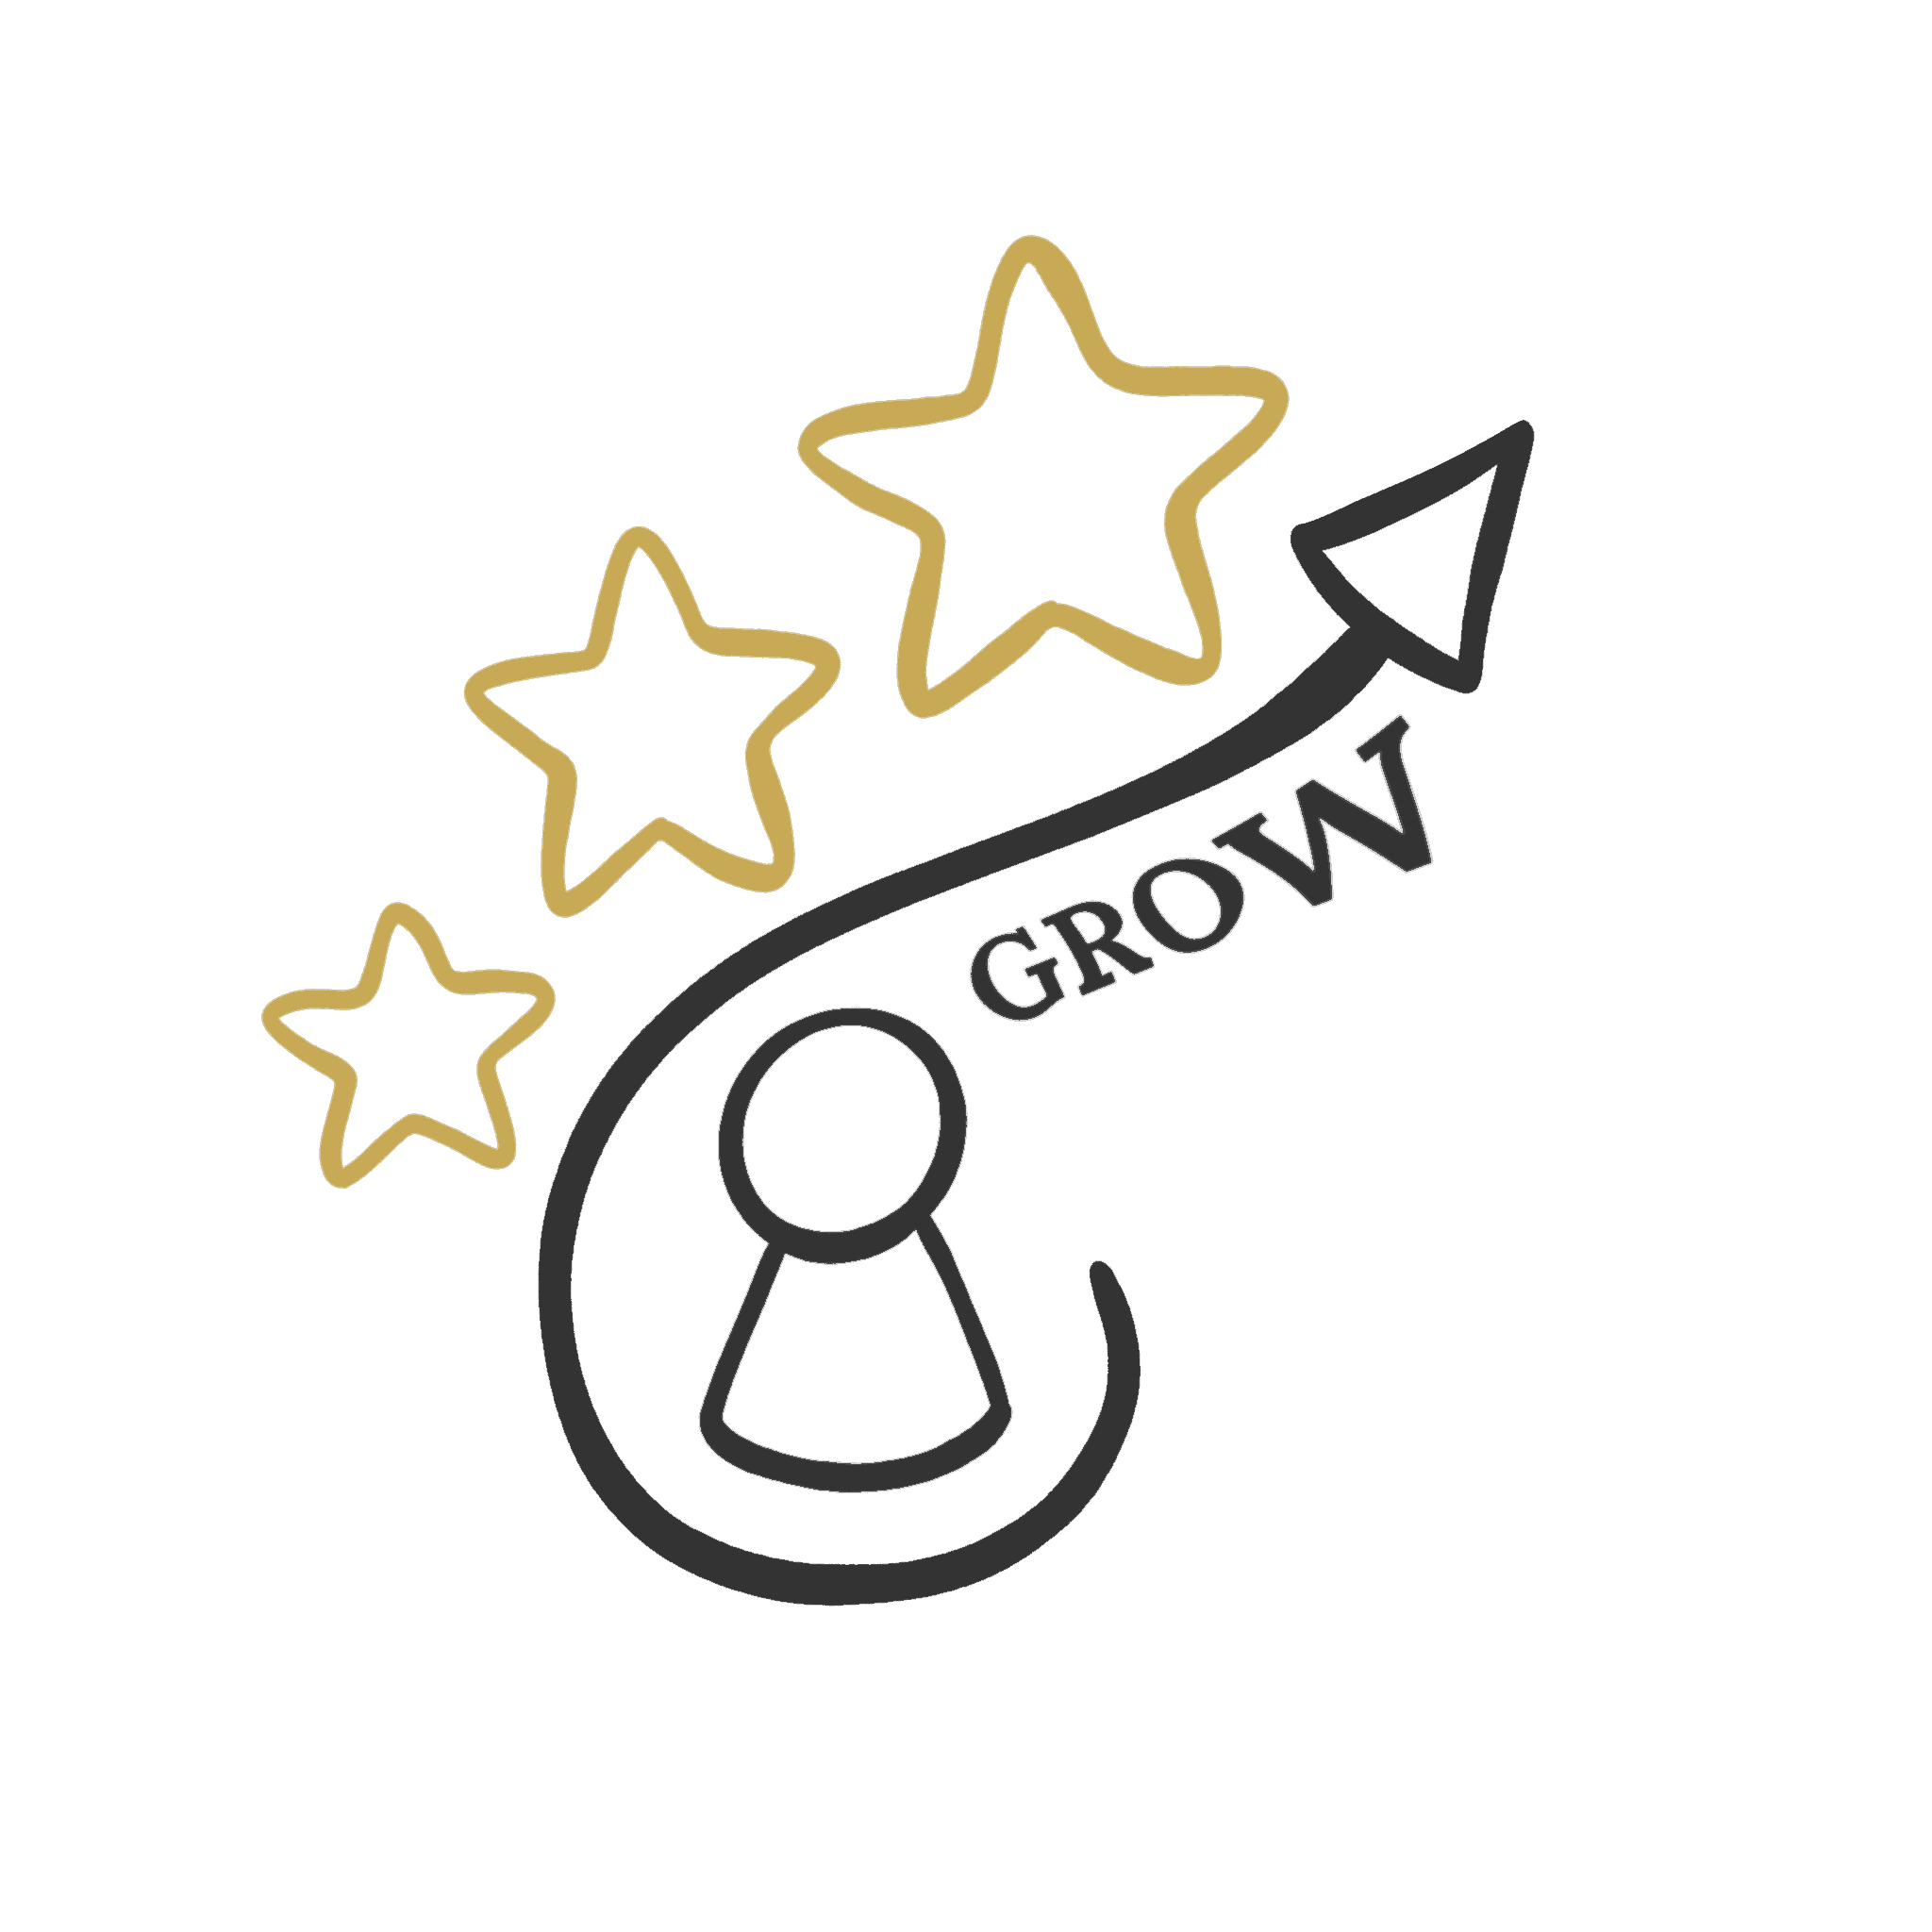 Icon_2 Grow Goud-Grijs